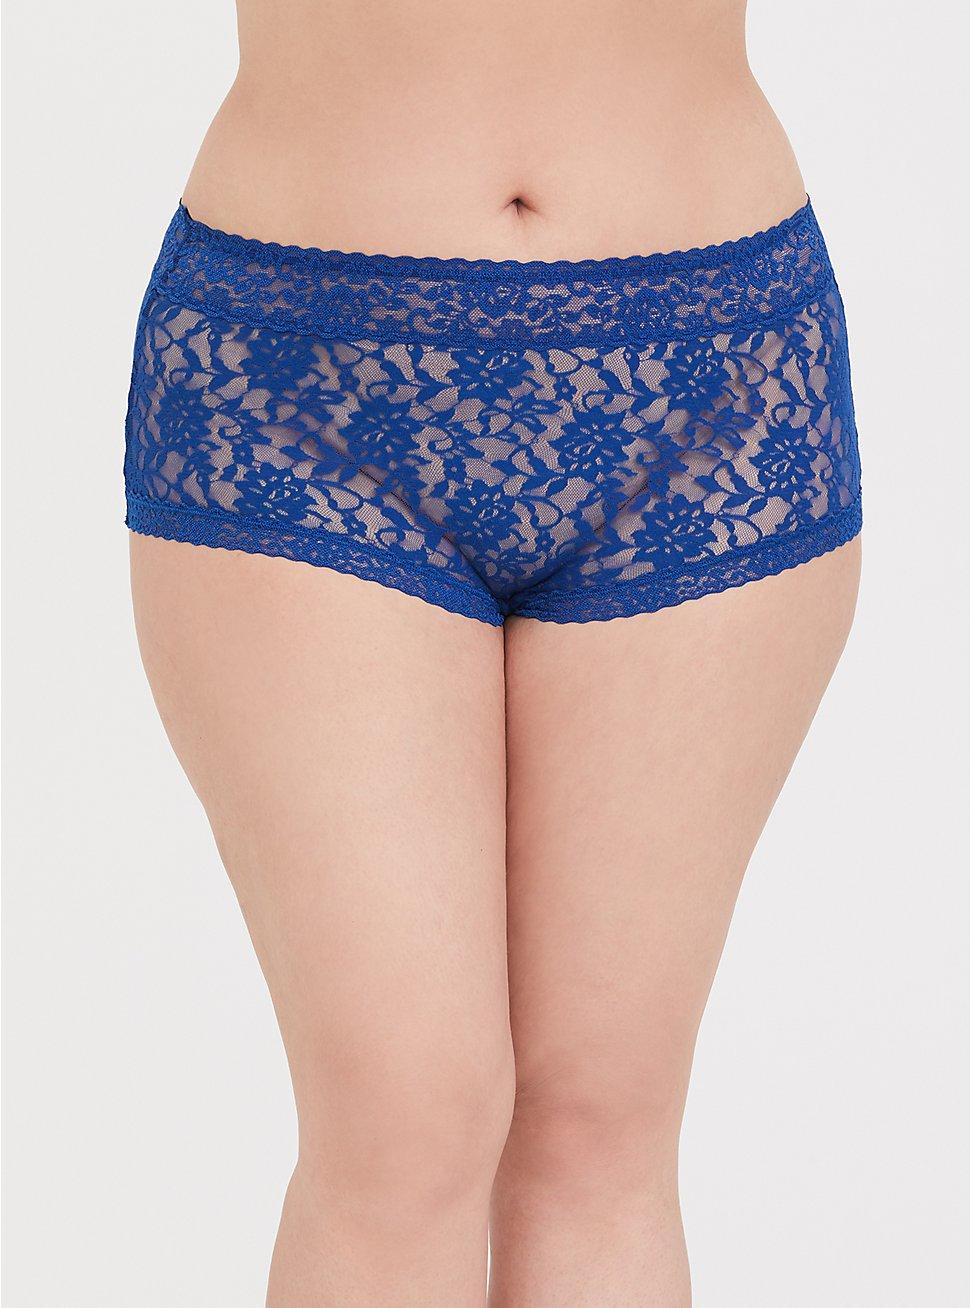 Sapphire Blue Lacey Brief Panty, LIMOGES BLUE, hi-res